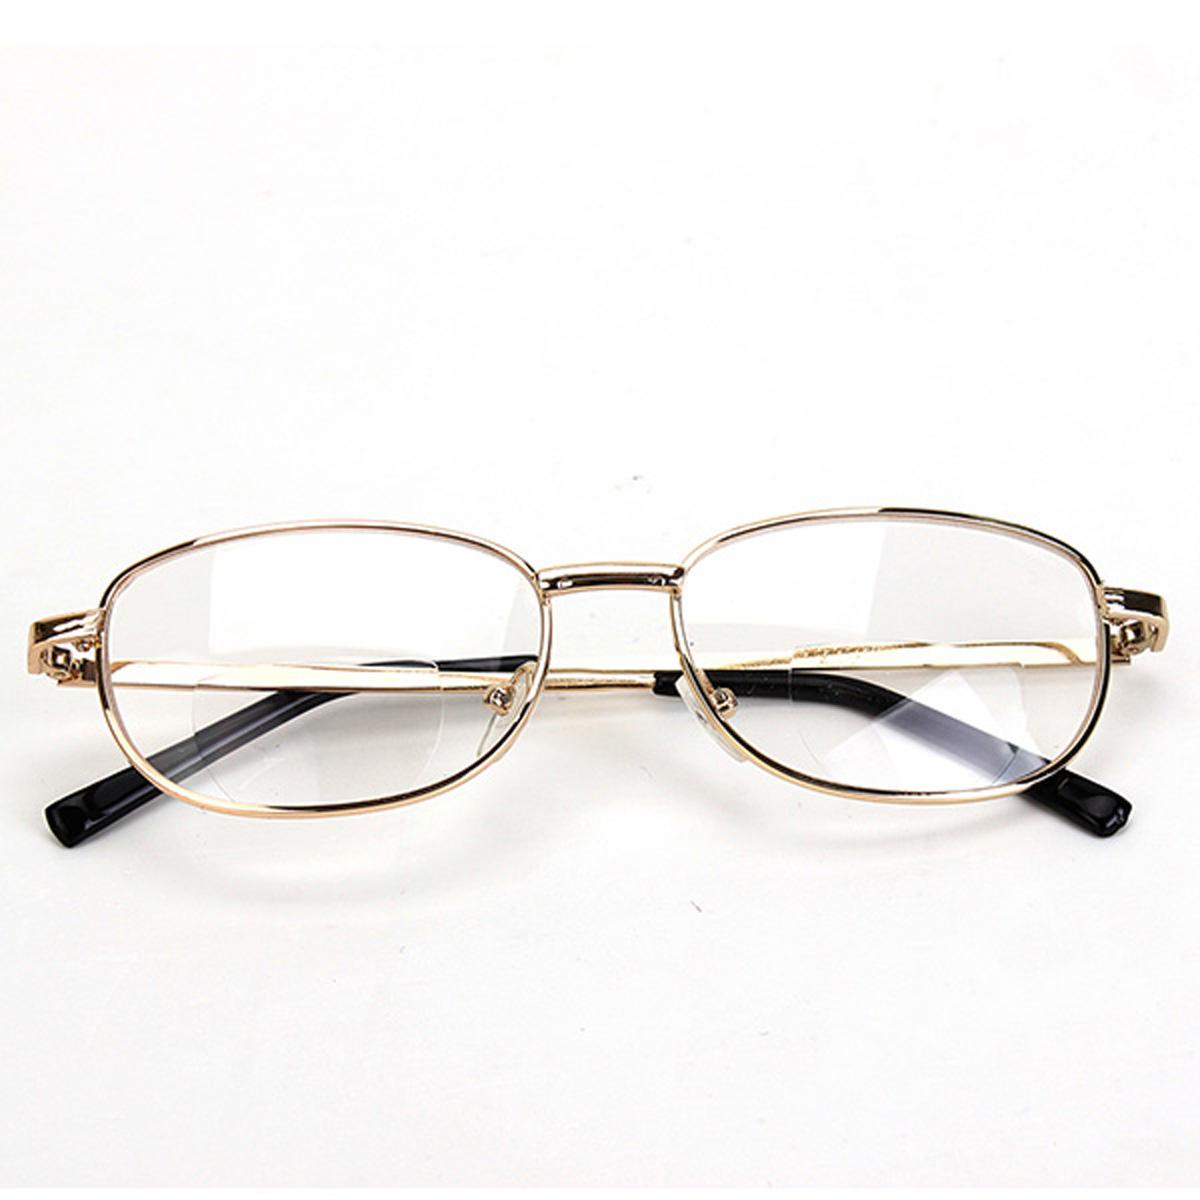 Fashion Bifocal Lens Rimmed Men S Reading Glasses Gold